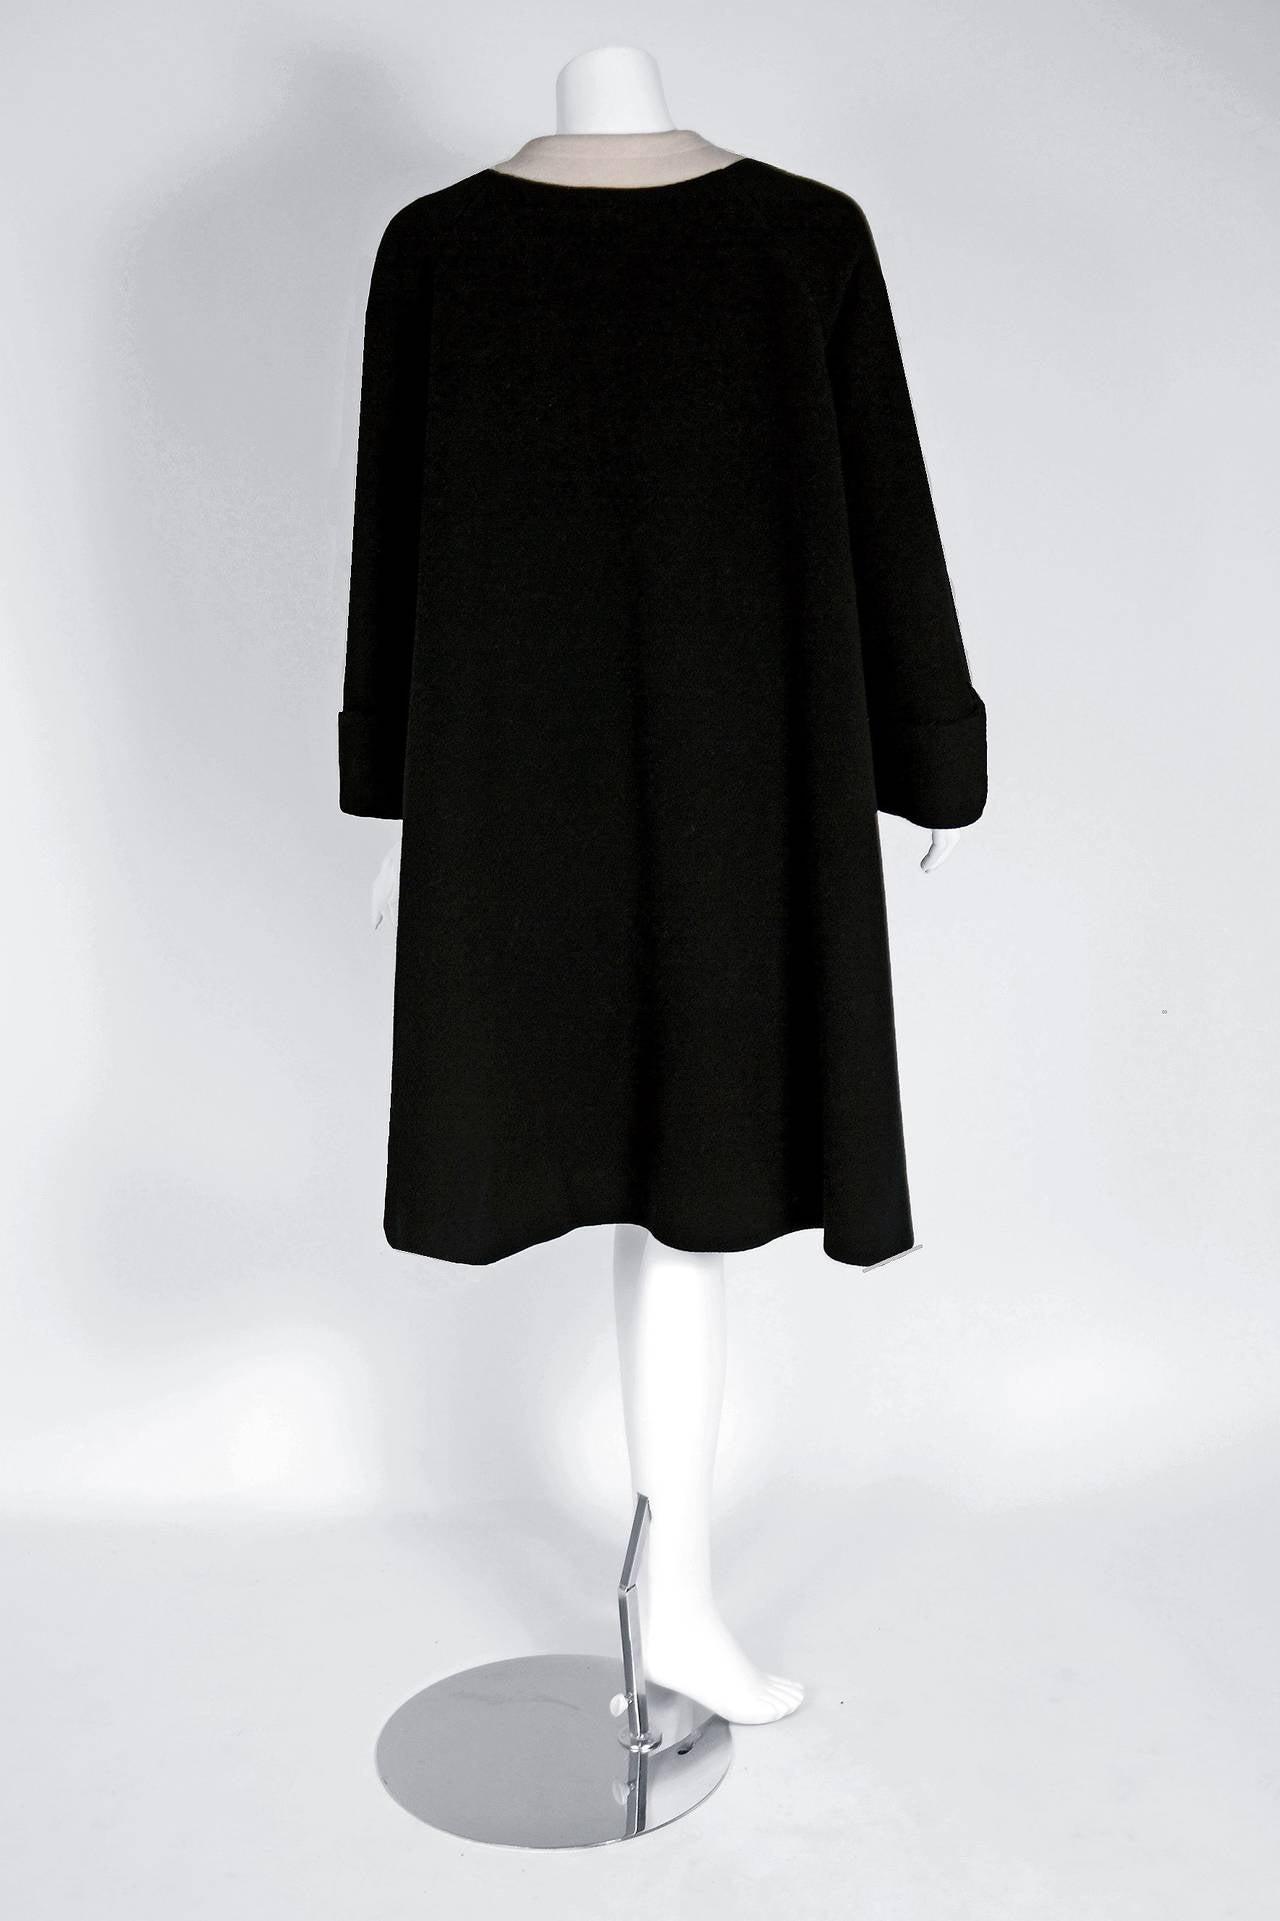 1960's Pierre Cardin Black & Ivory Block-Color Wool Mod Space-Age Swing Coat For Sale 2